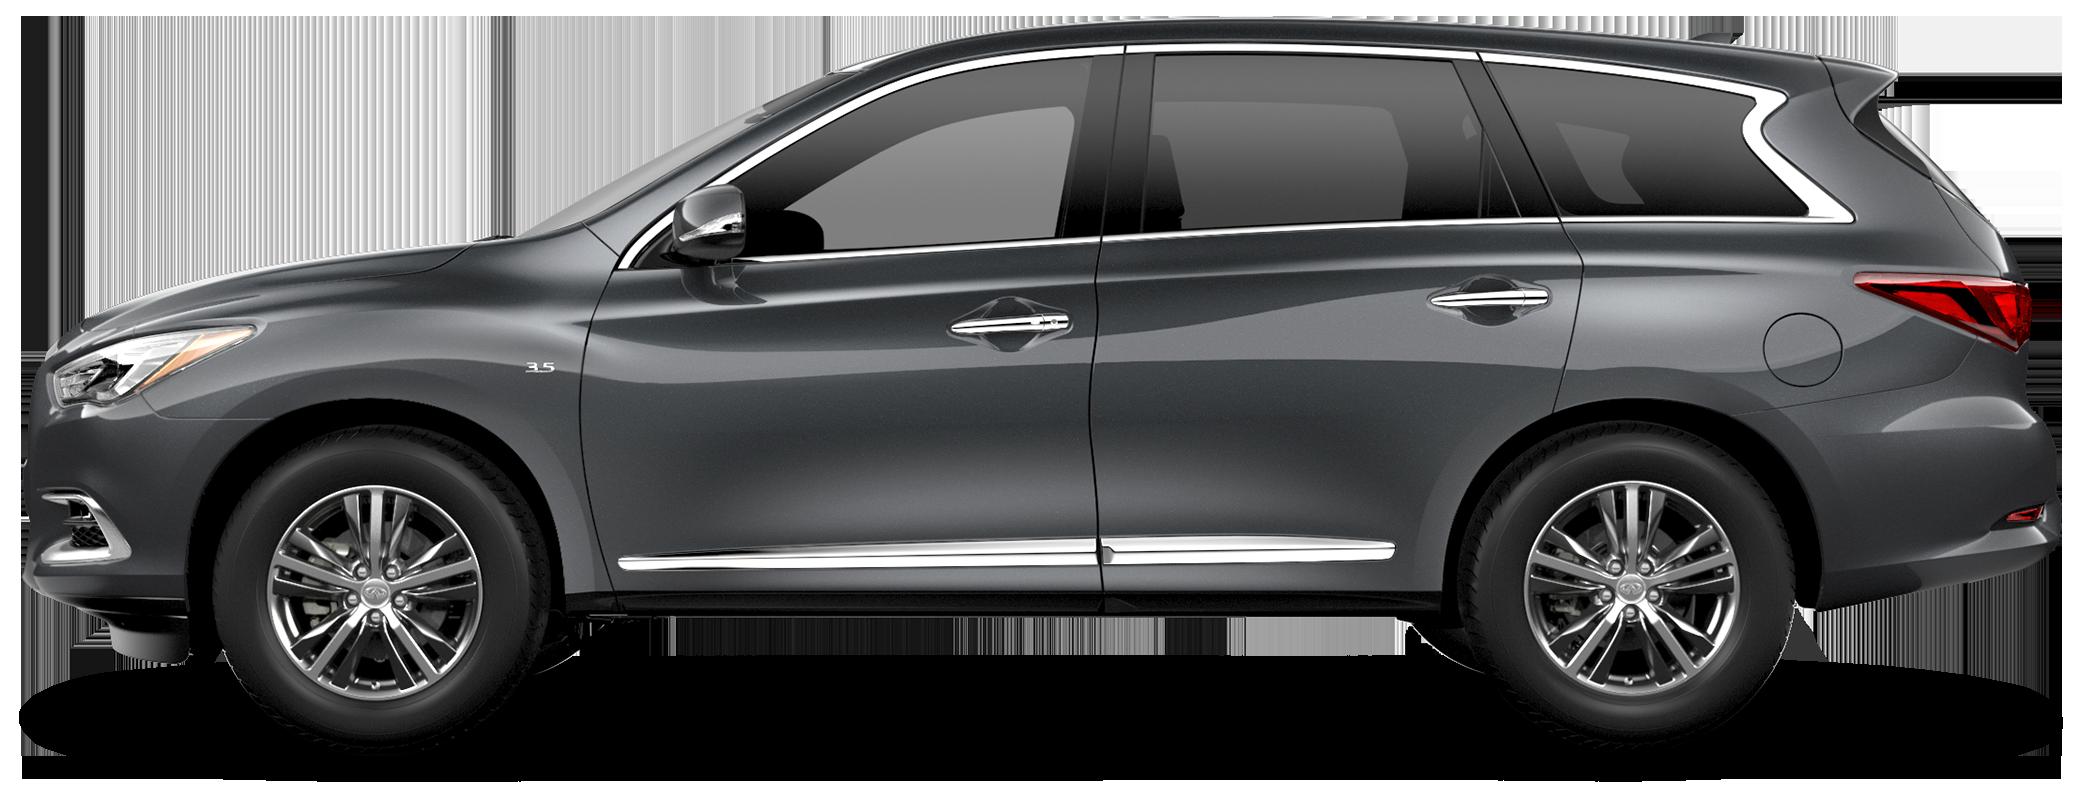 2020 INFINITI QX60 SUV LUXE